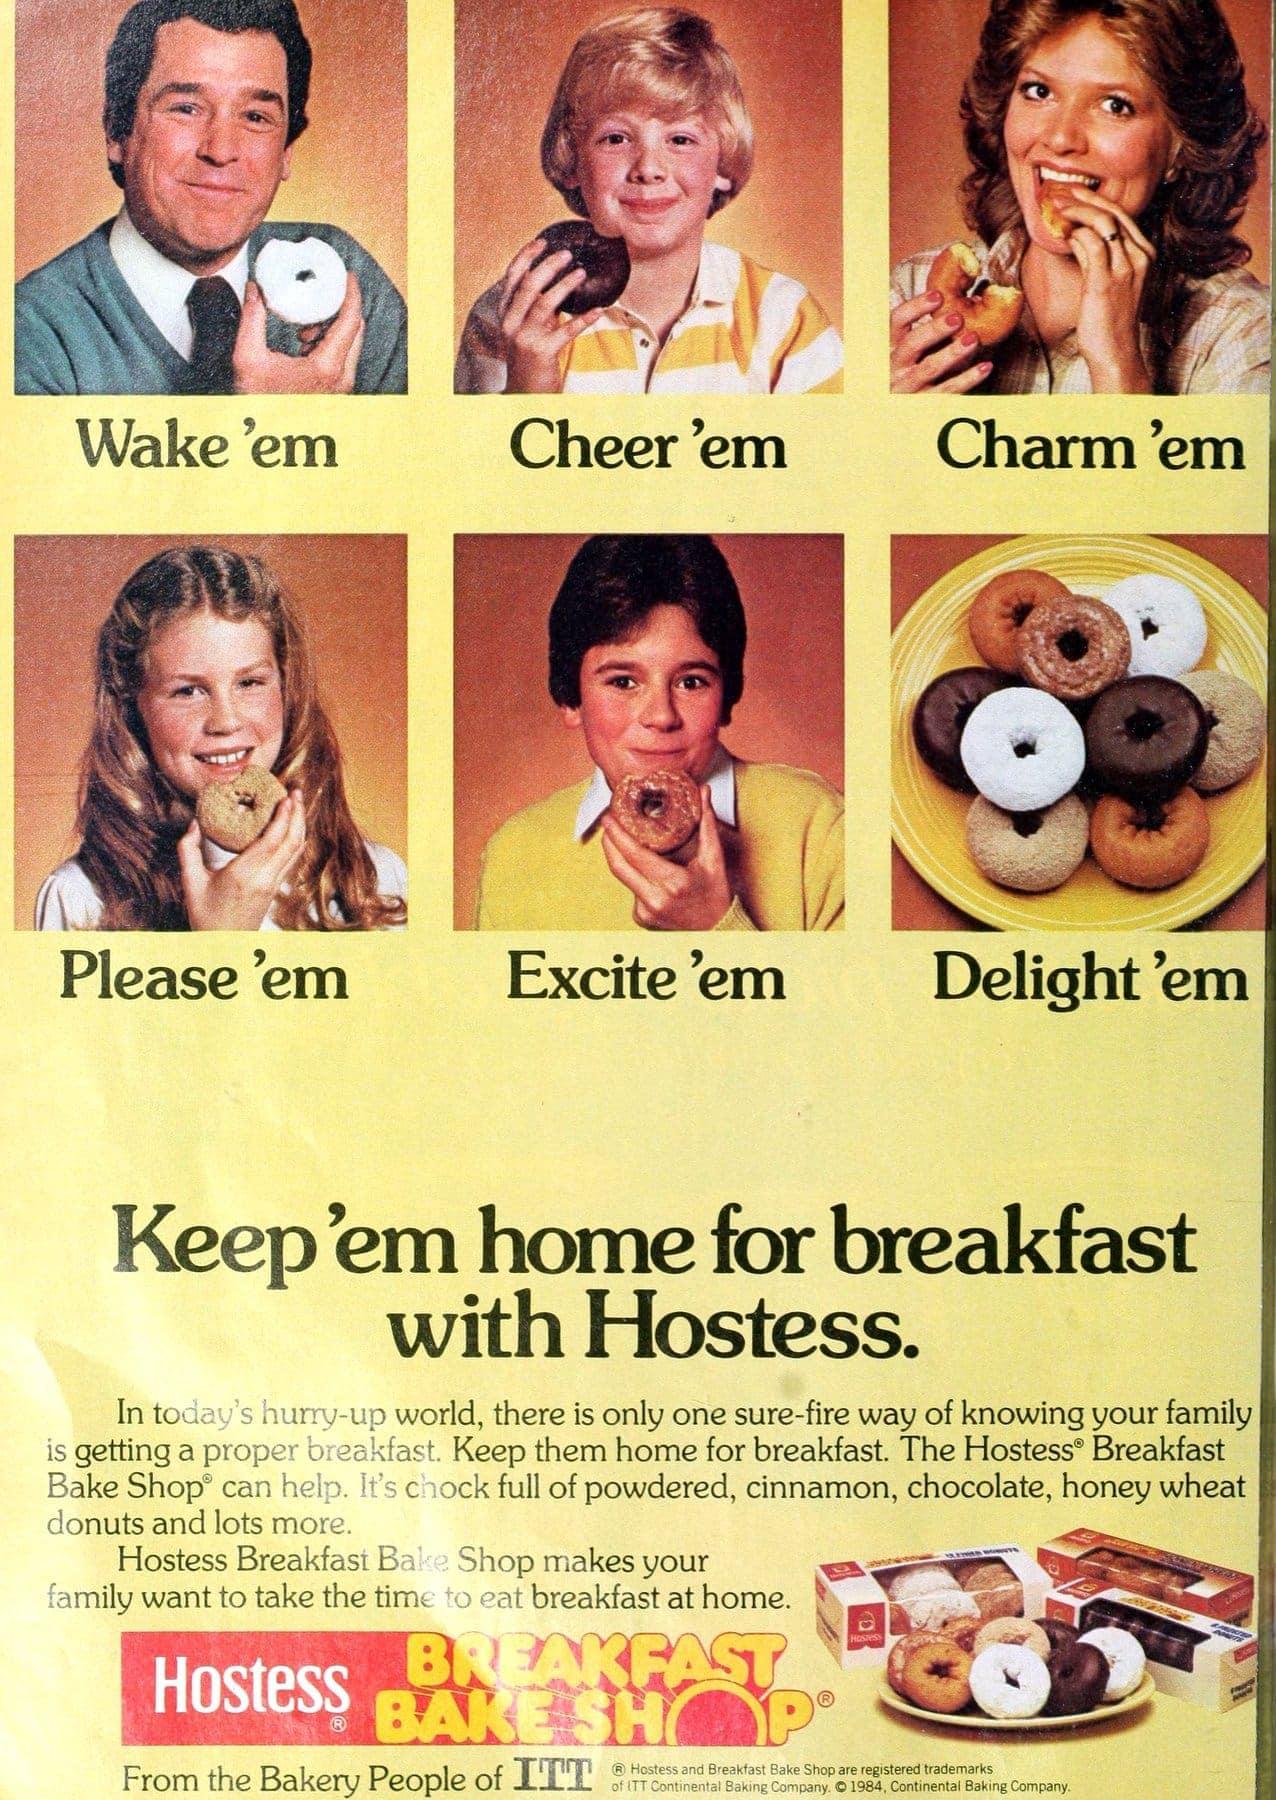 Vintage Hostess Breakfast Bake Shop donuts from 1984 (2)